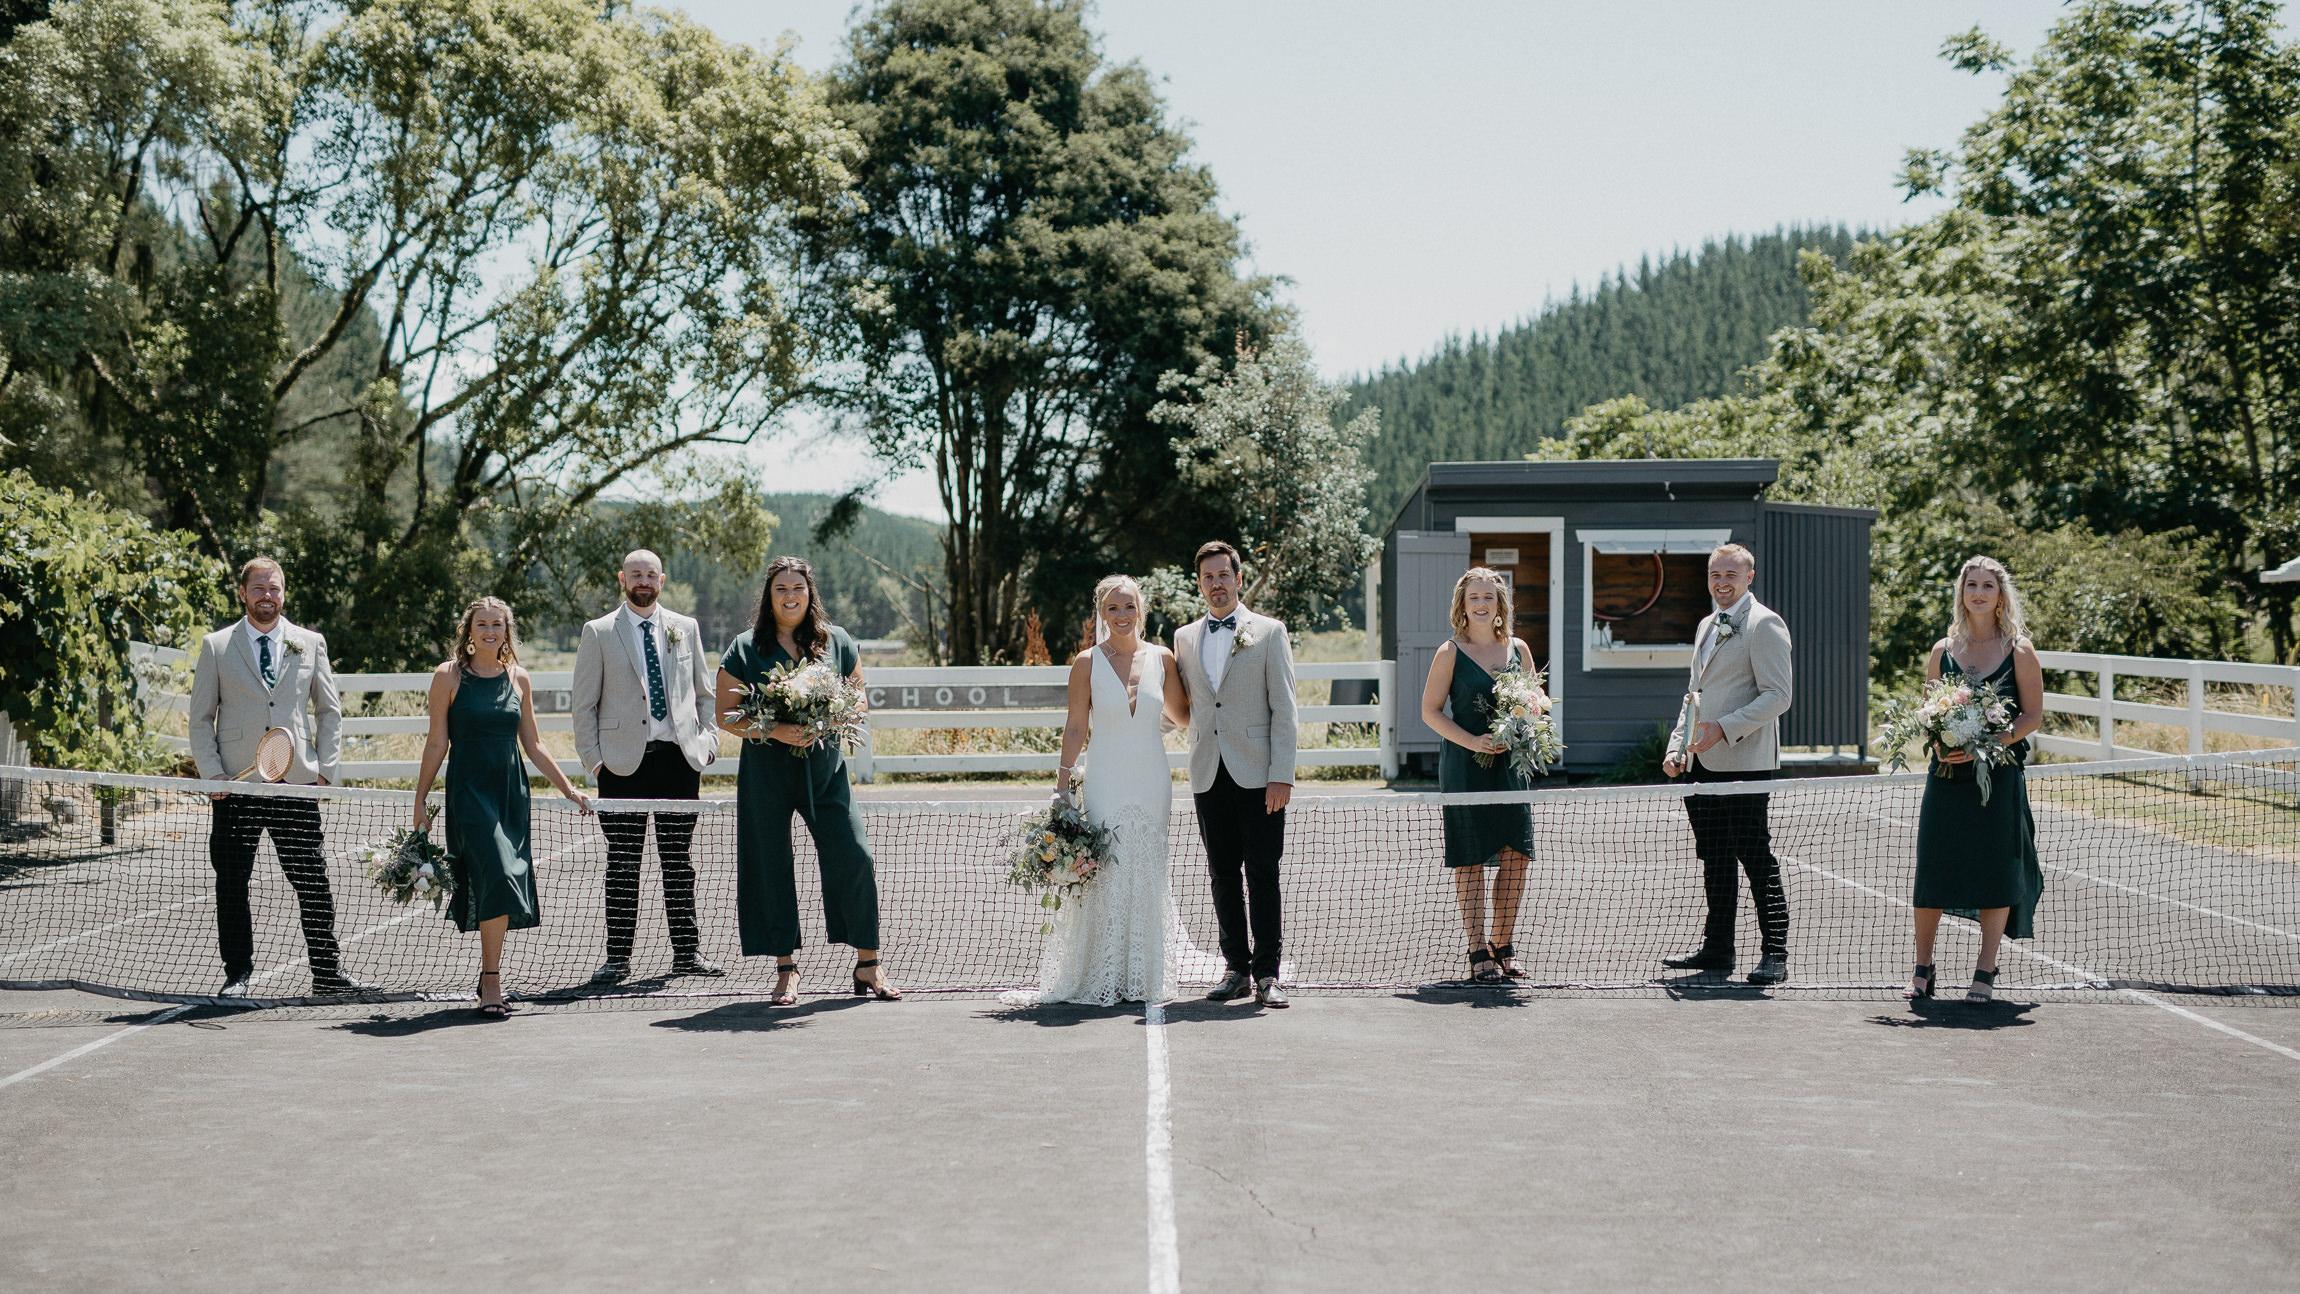 oldforestschool-wedding-blog-73.jpg